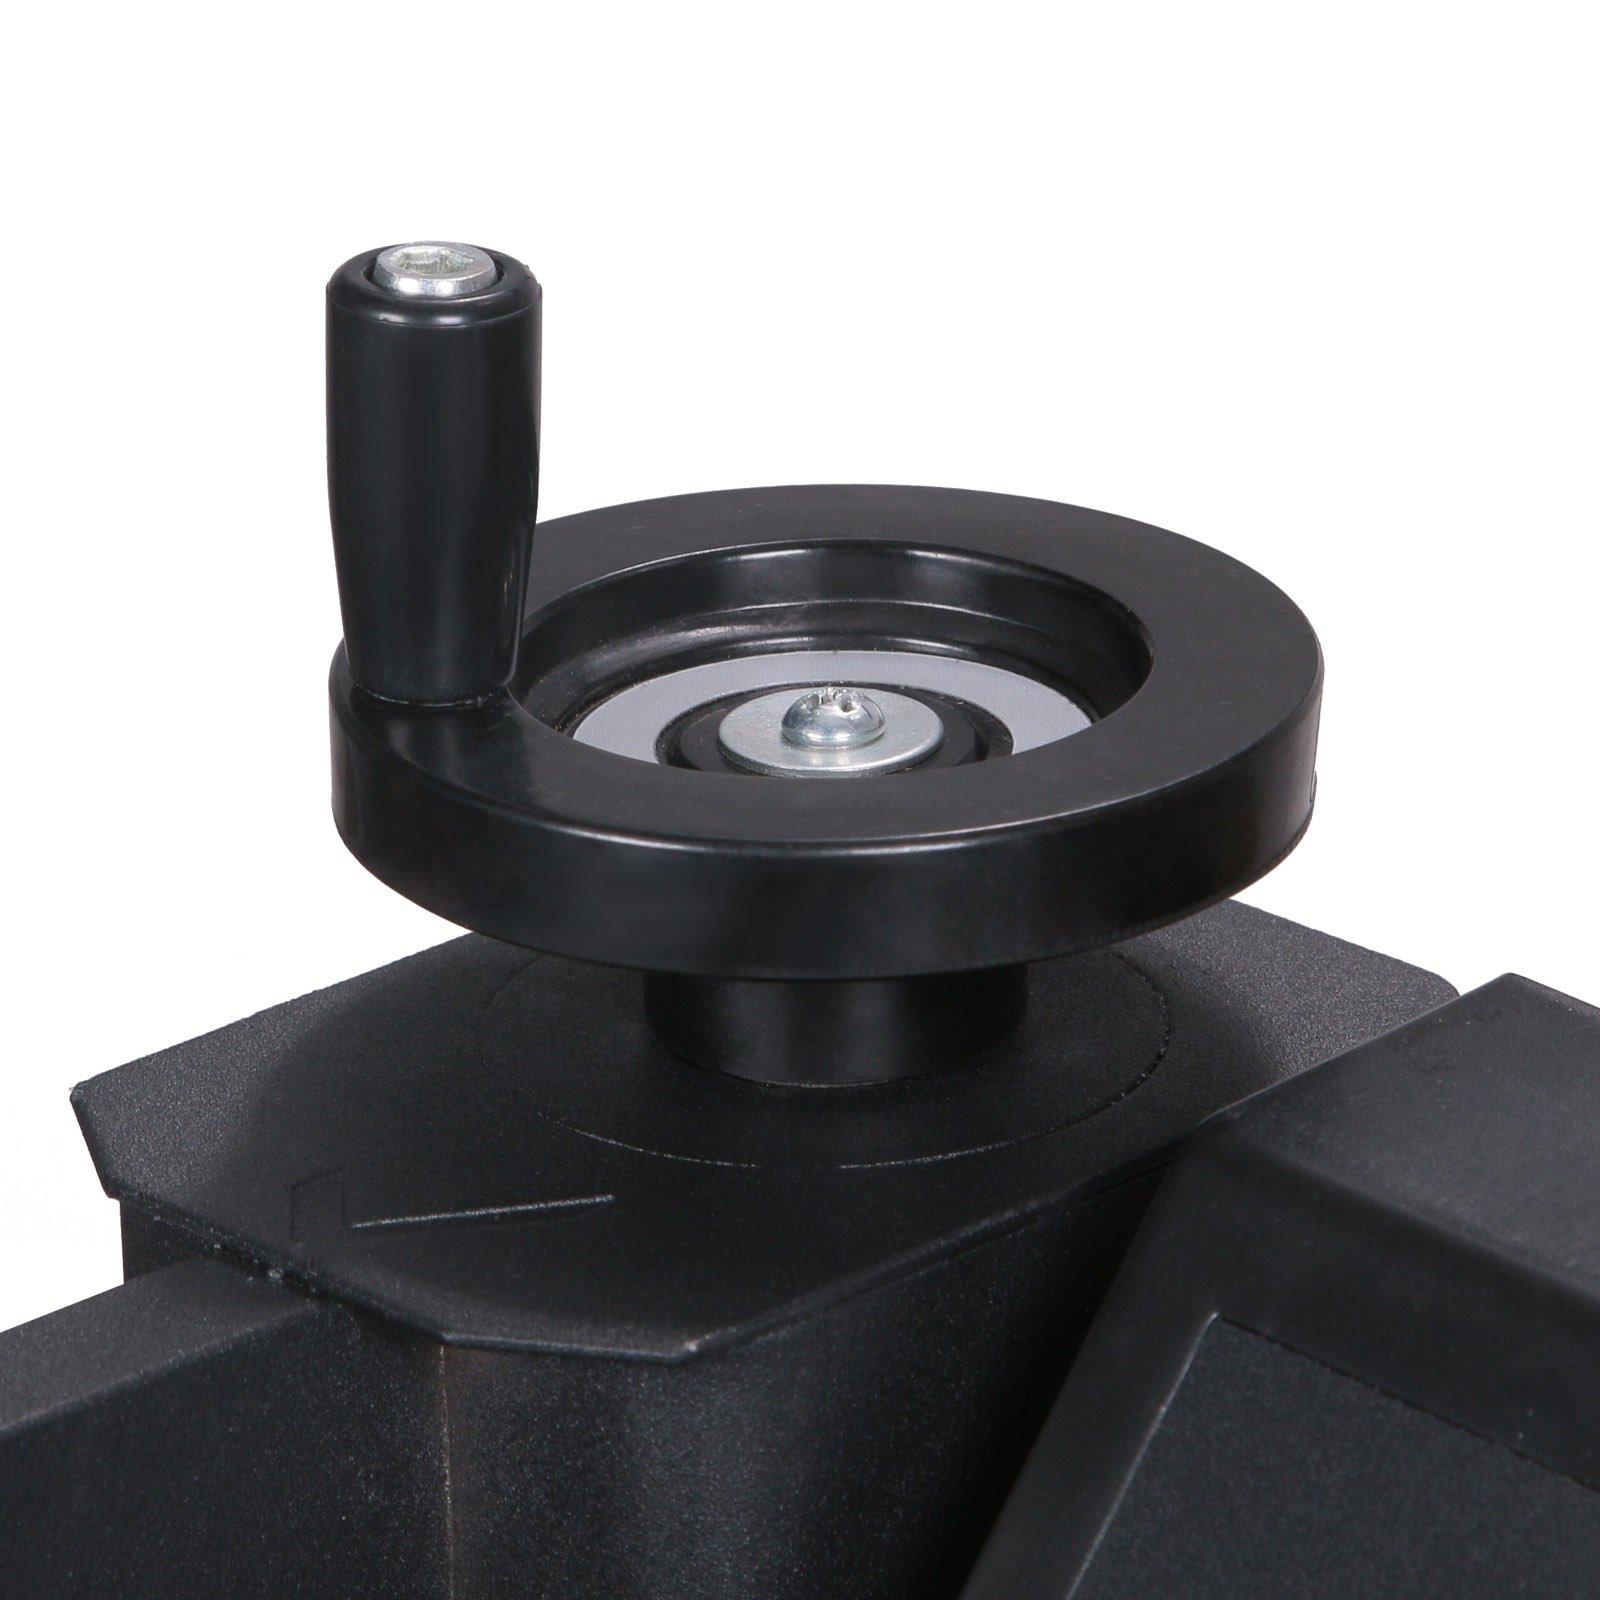 Ceny 5 In1 Digital Heat Press Machine 12 X 15 Inch Swing Away Heat Press Transfer Sublimation DIY T-Shirt Mug Hat Plate T-shirt Press Machine with Clamshell Design (5 In1 1250W)